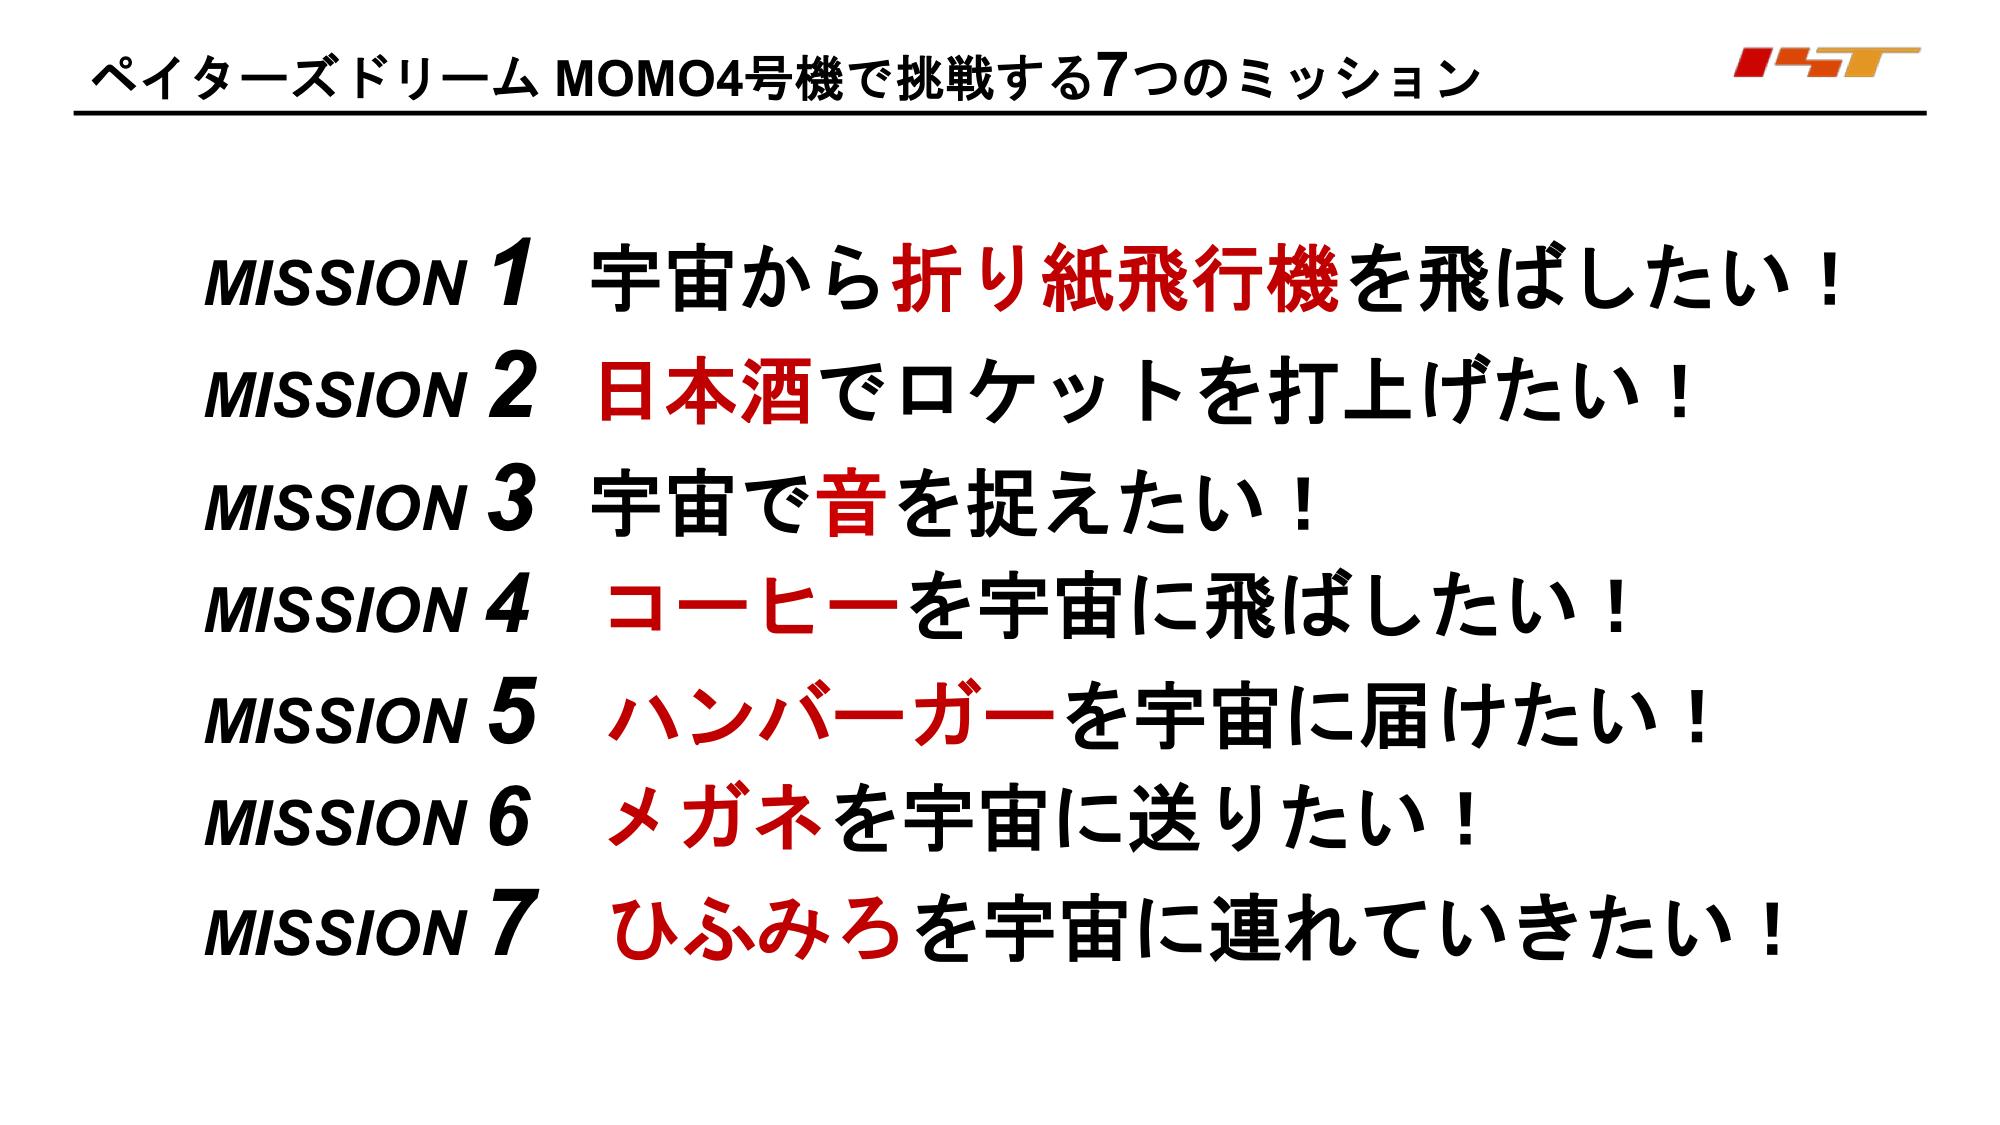 f:id:Imamura:20190628161135p:plain